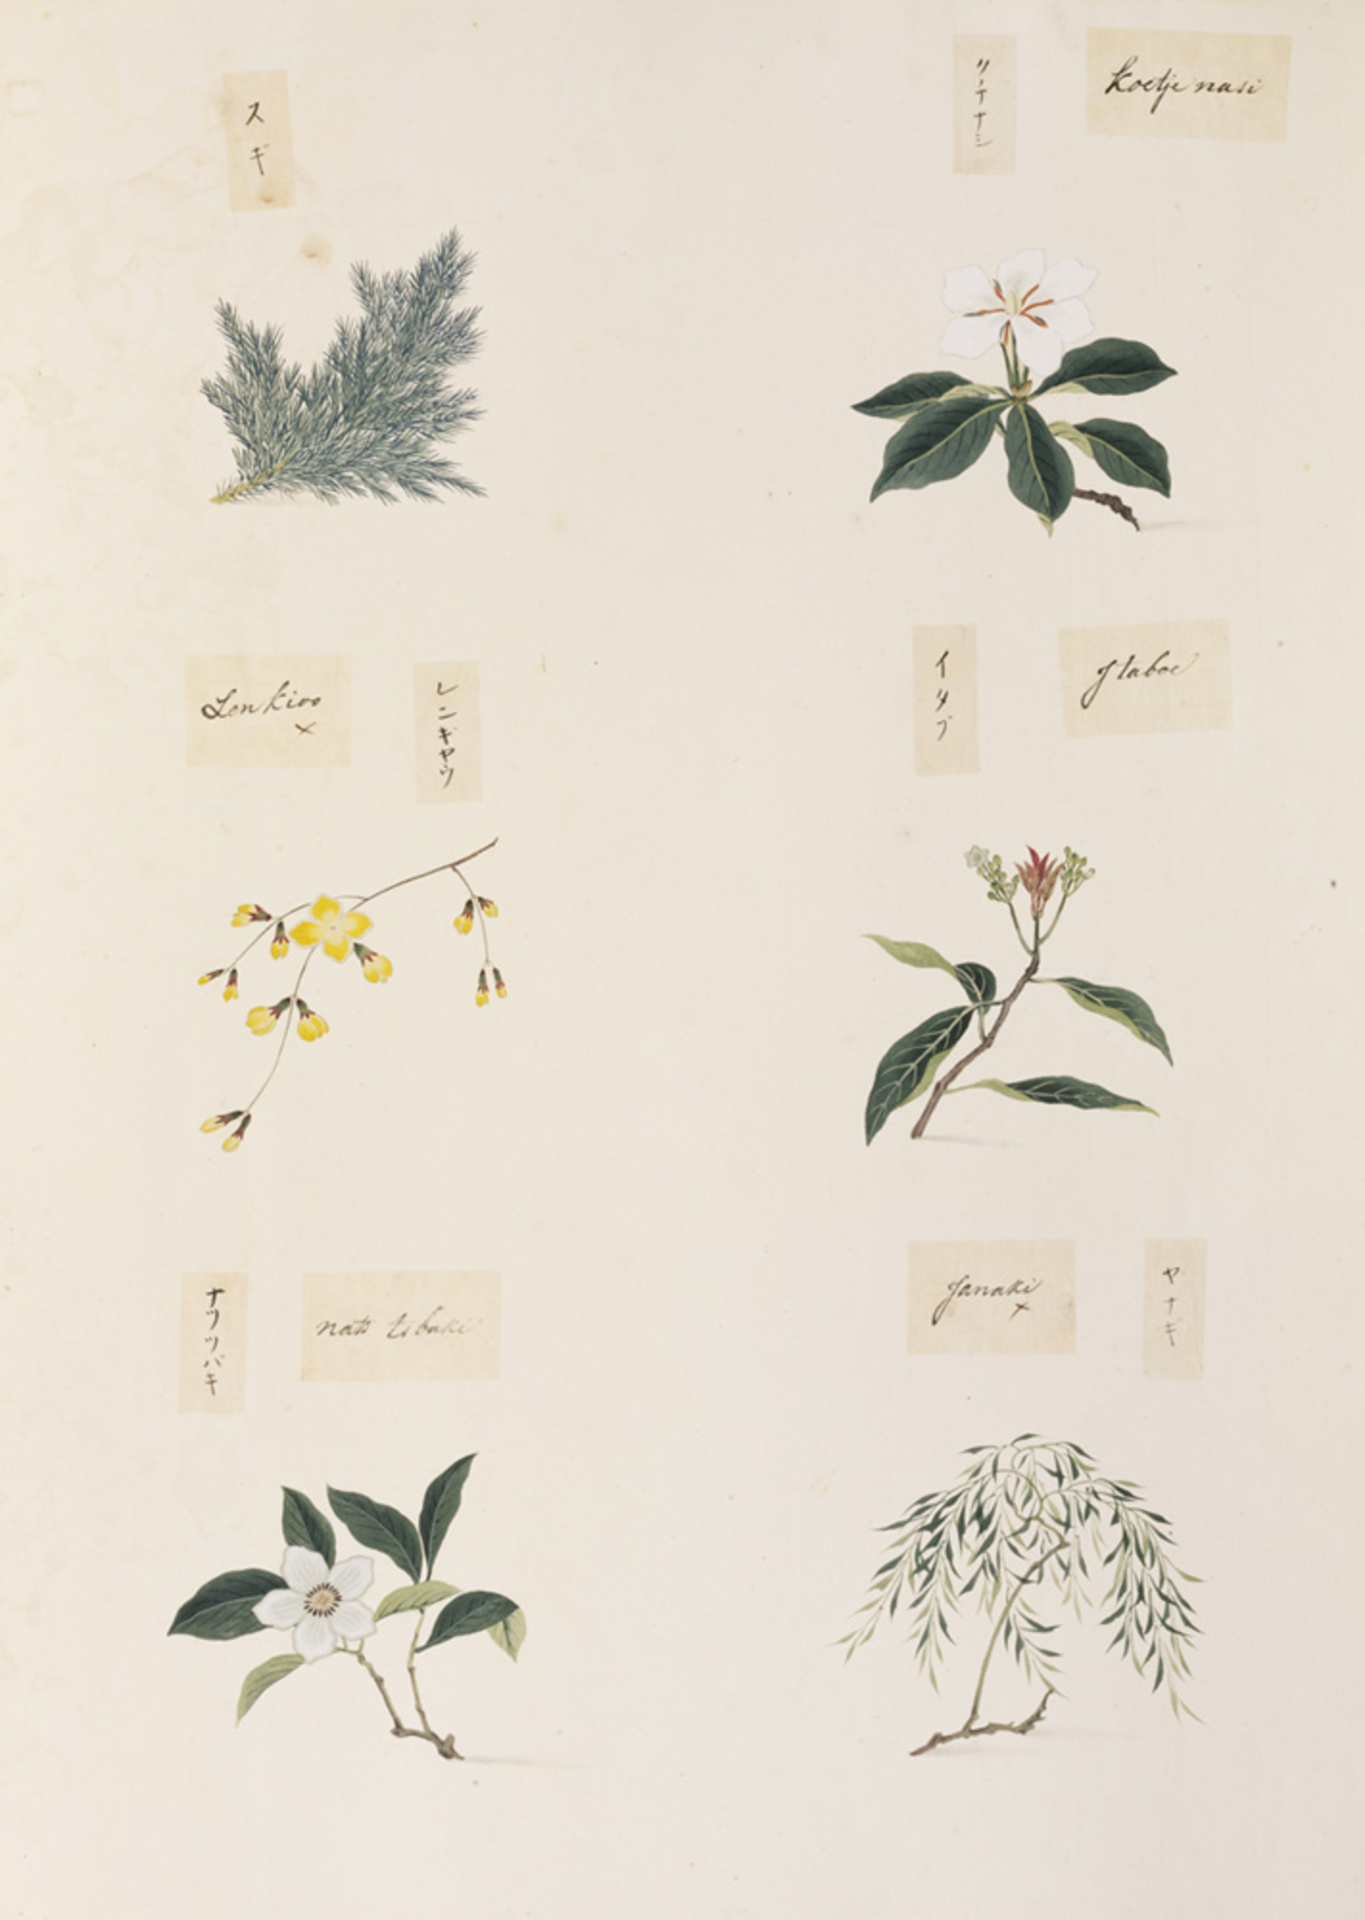 RMNH.ART.361   Salix sp.